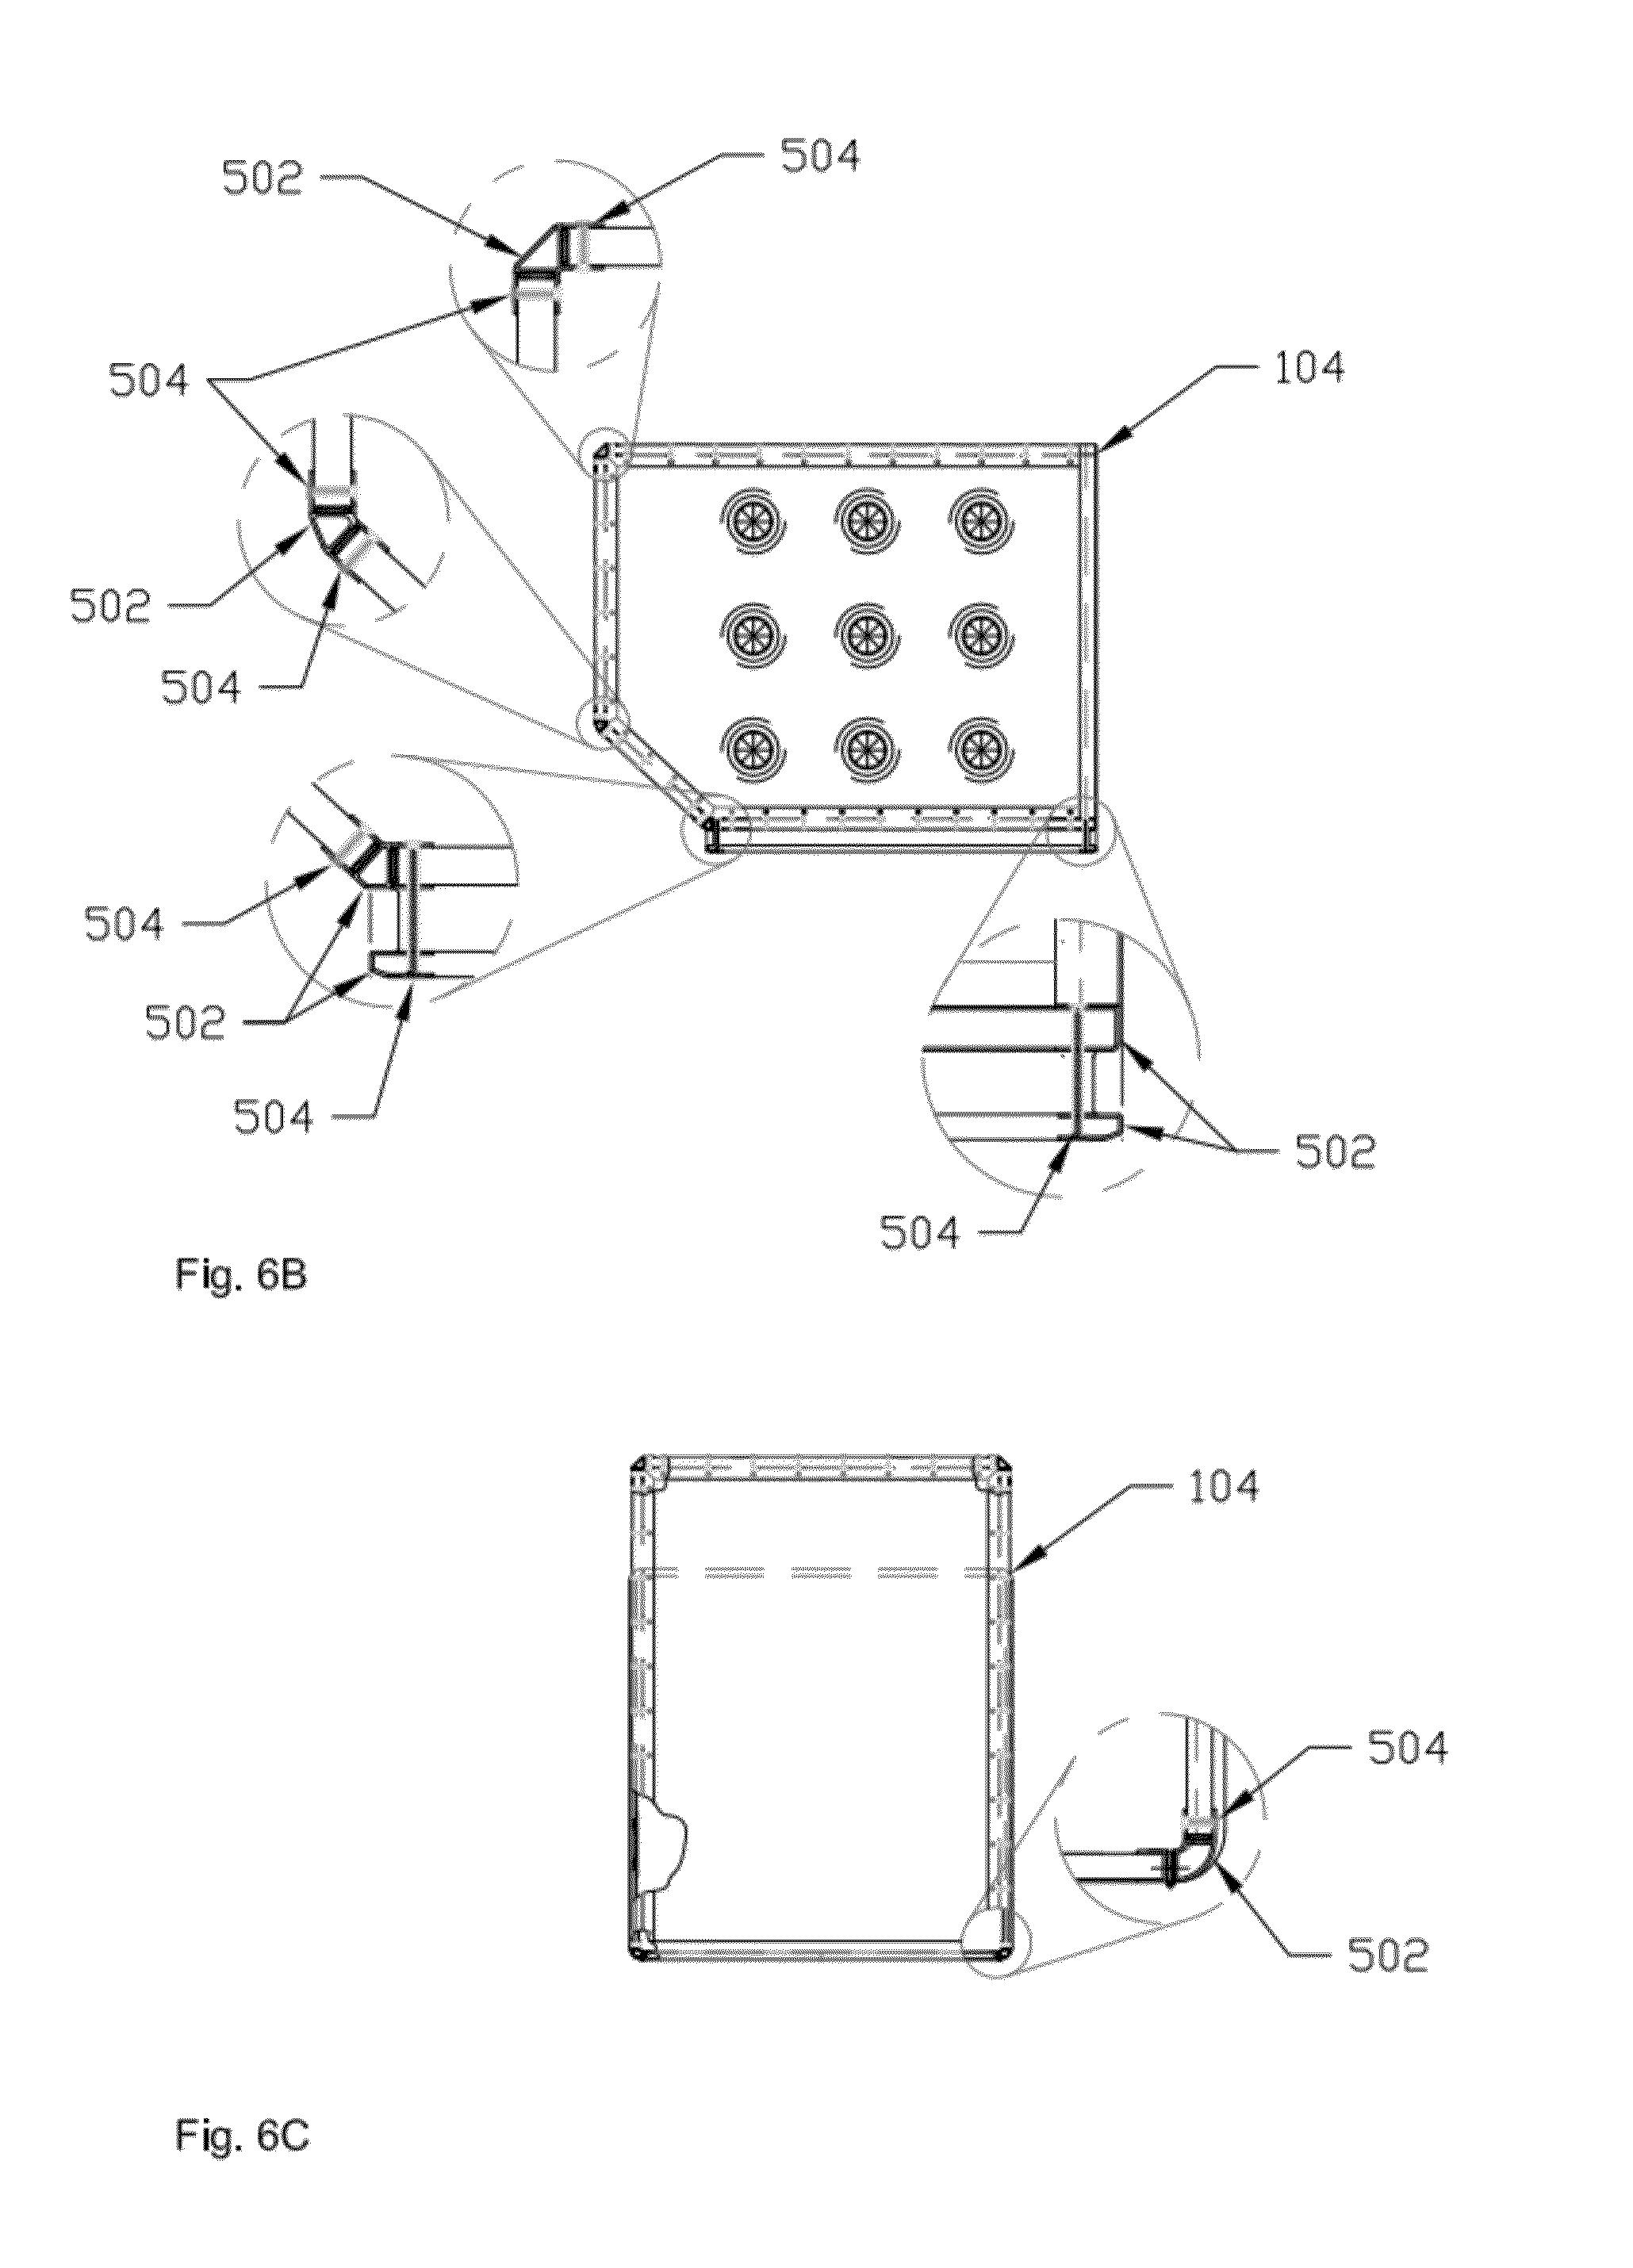 Lowrance Nmea 0183 Wiring. Diagram. Auto Wiring Diagram